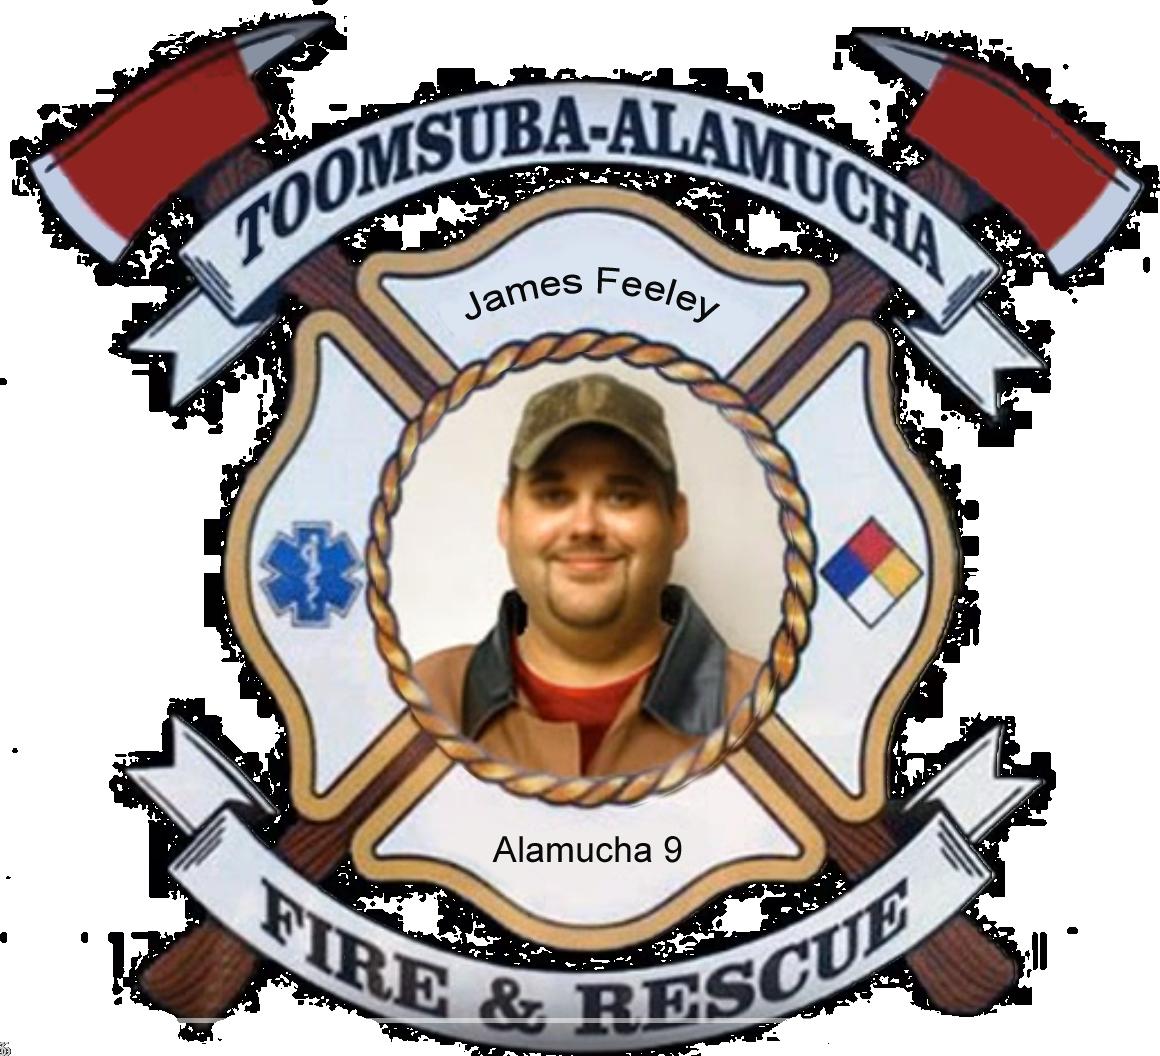 James Feeley; Toomsuba Firefighter